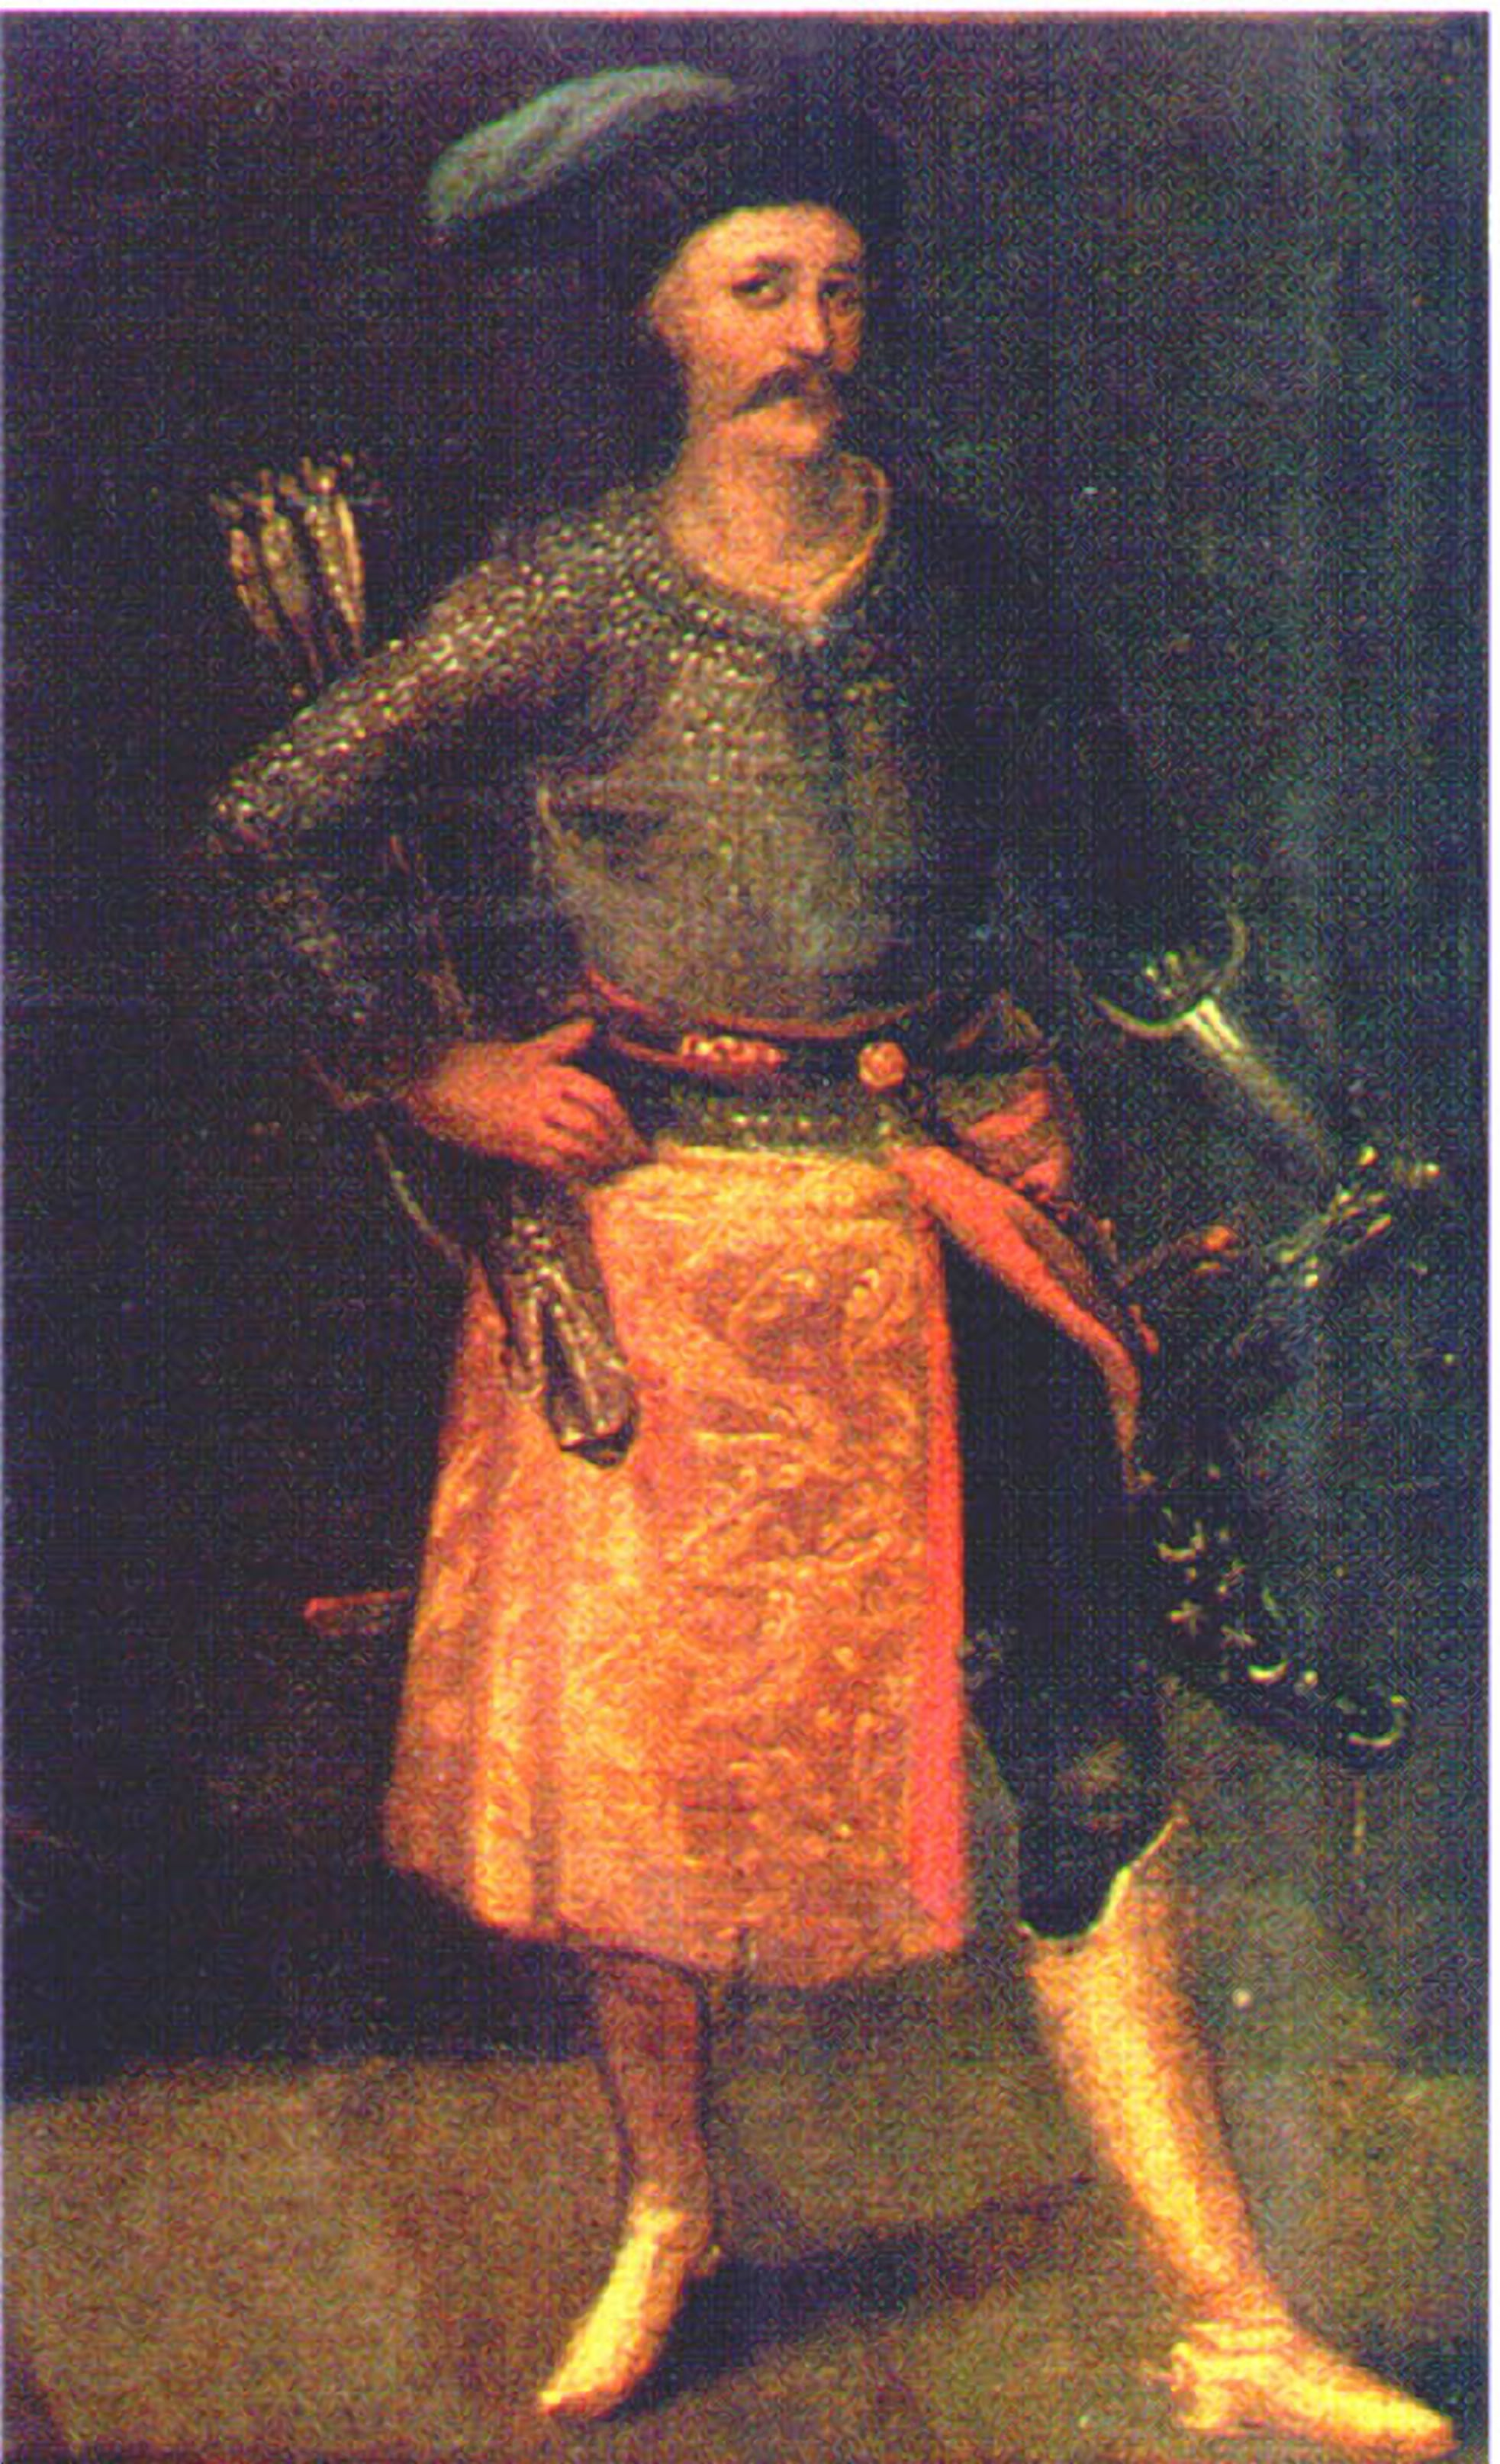 Ян Литовор Хрептович